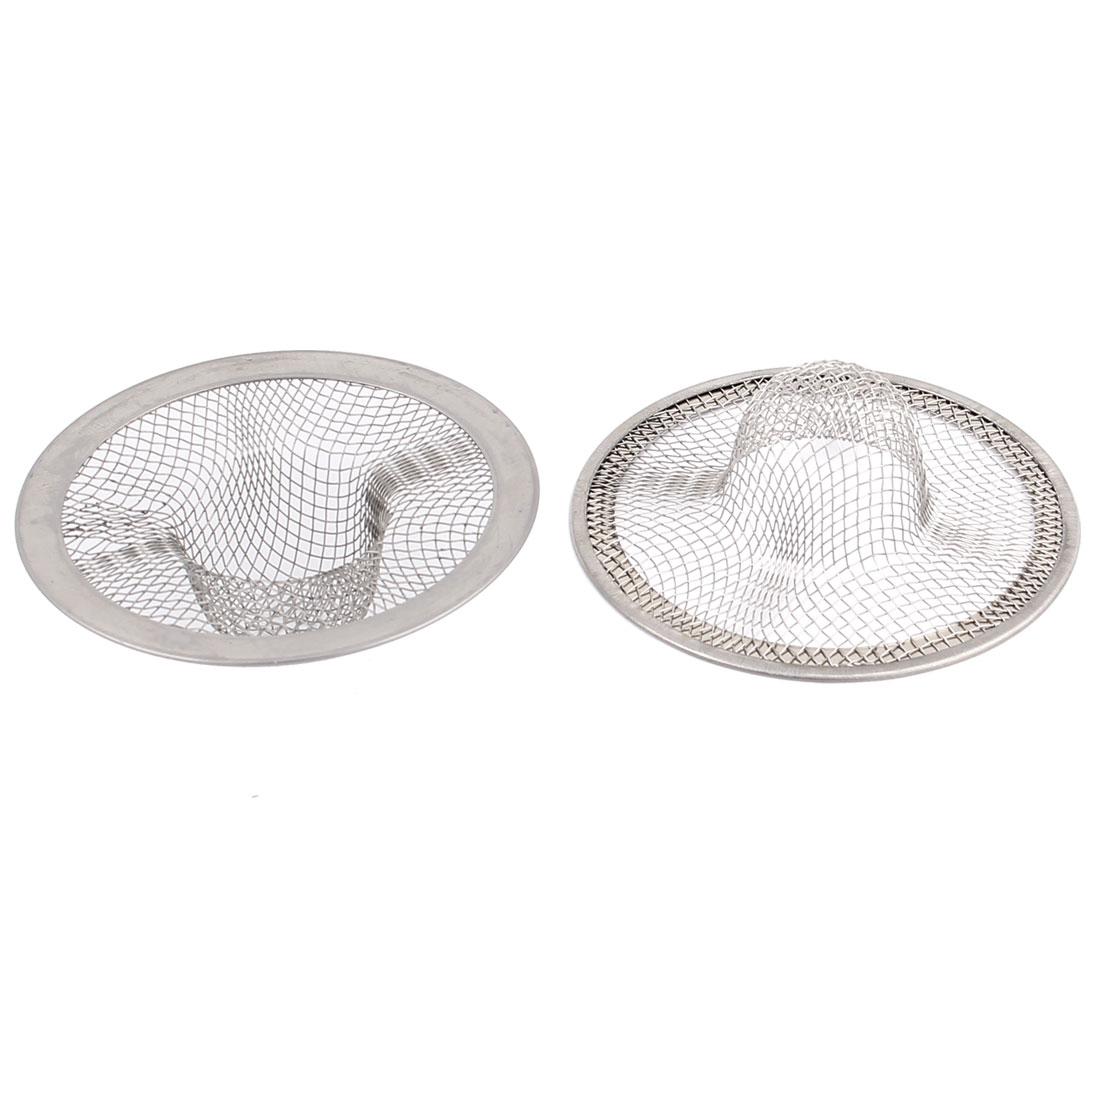 Bathroom Bathtub Metal Mesh Hole Design Basin Sink Drain Strainer Stopper Basket 71mm Dia 2pcs